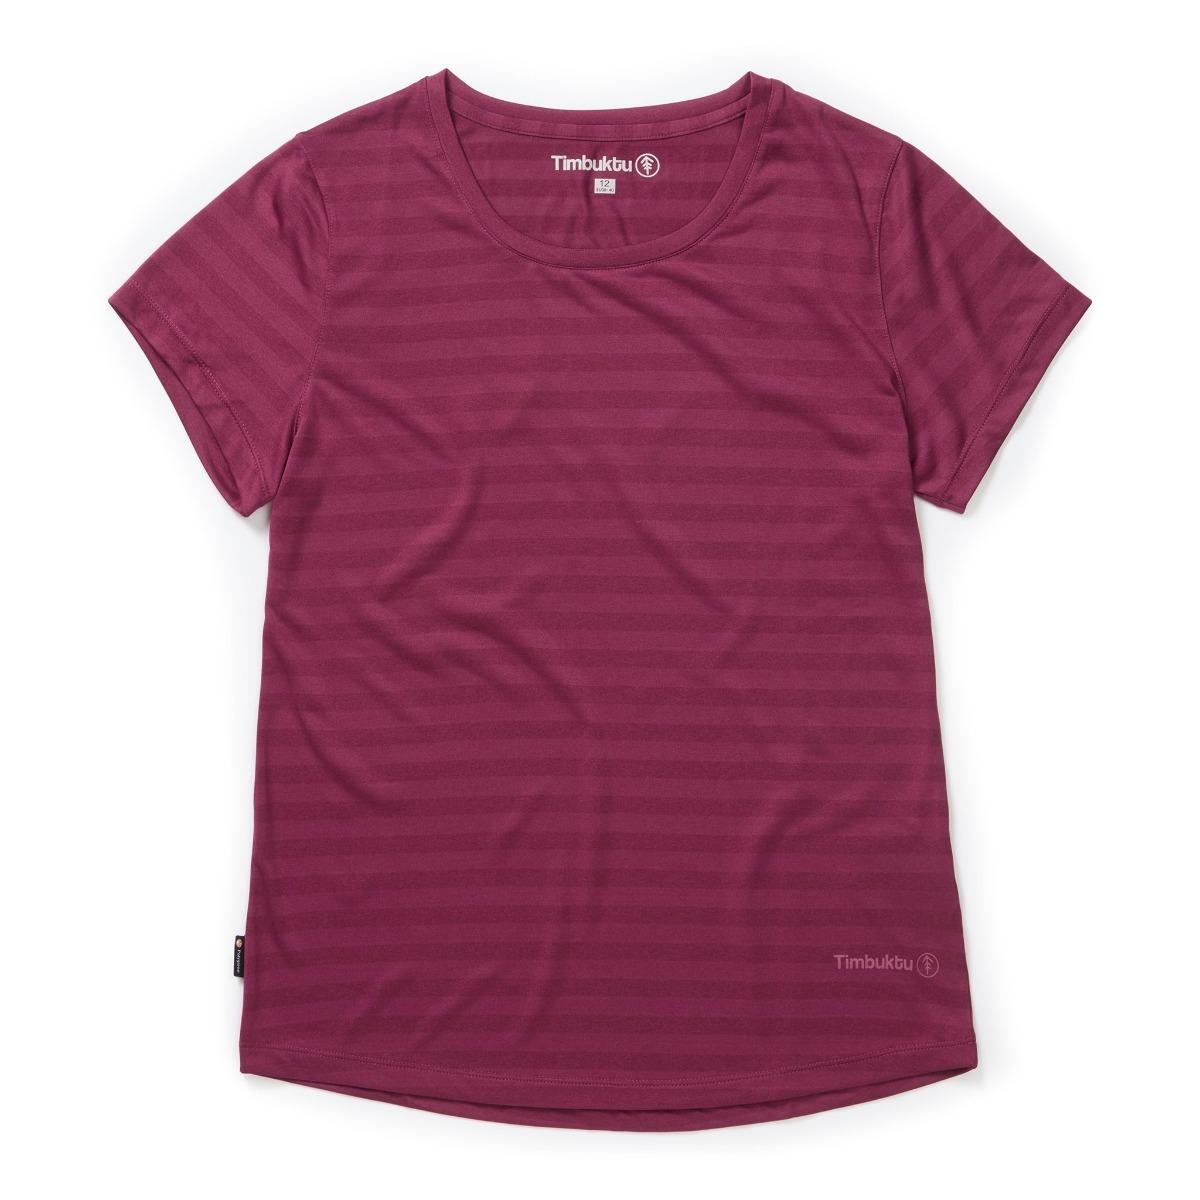 Timbuktu Womens Askia T-shirt - Berry - 8